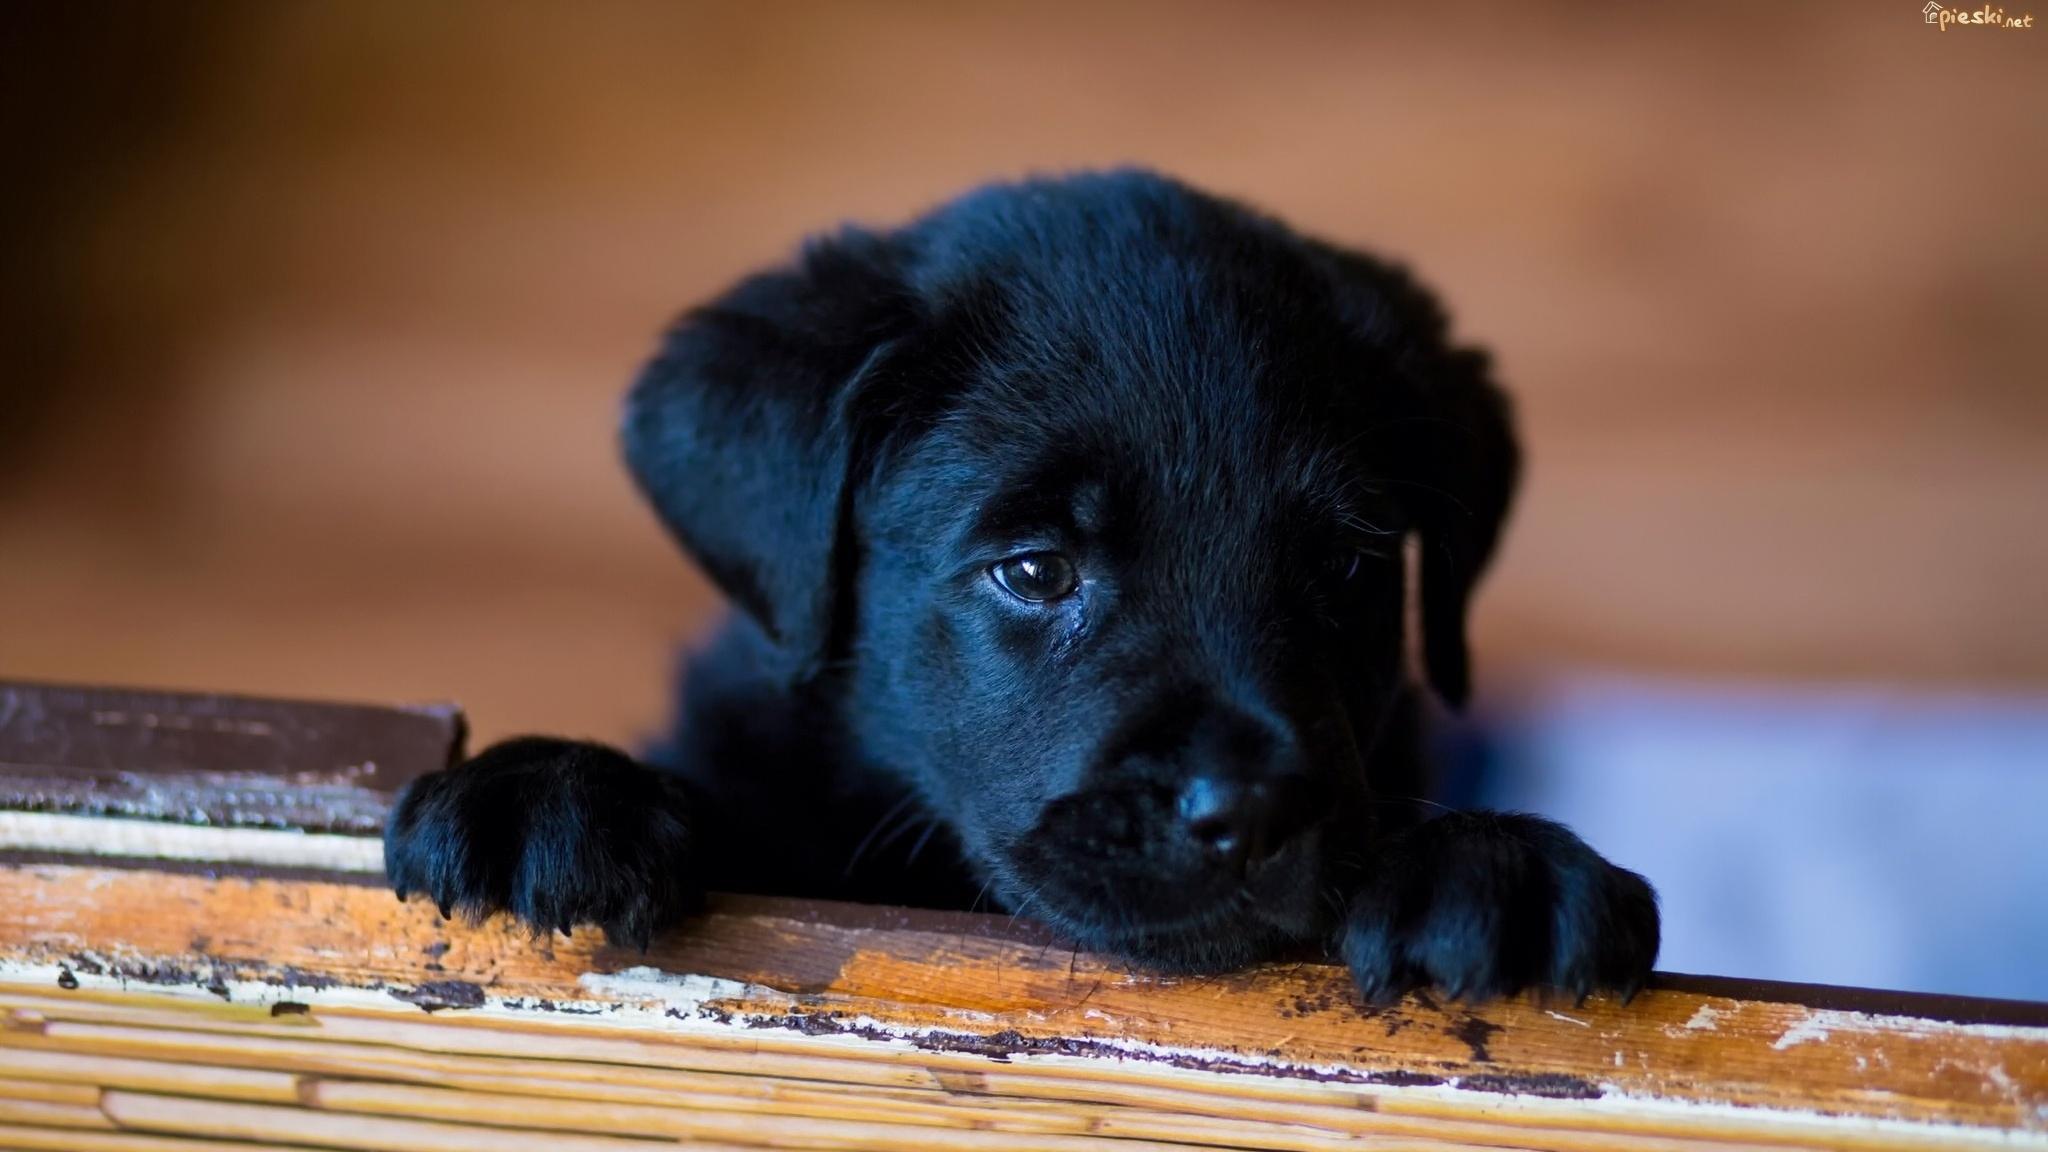 Cute Mutt Dog Black Puppy